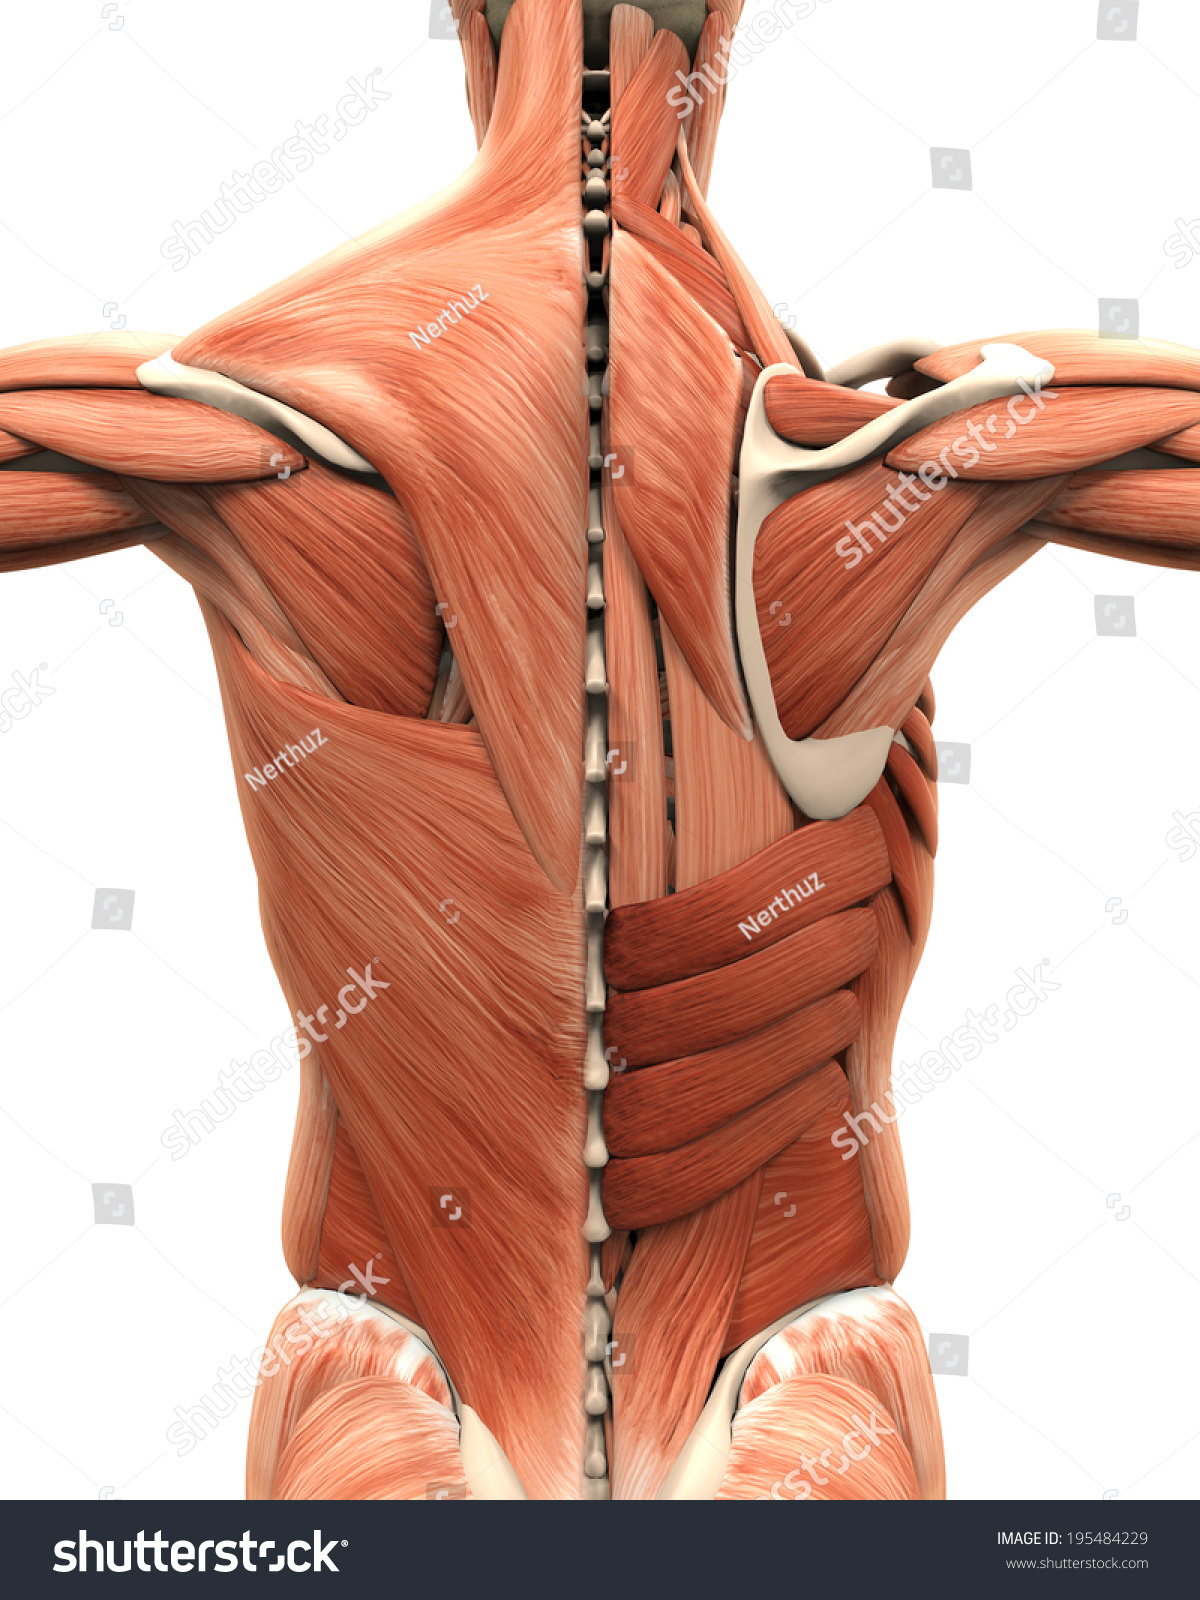 Muscular Anatomy Back Stock Illustration 195484229 - Shutterstock